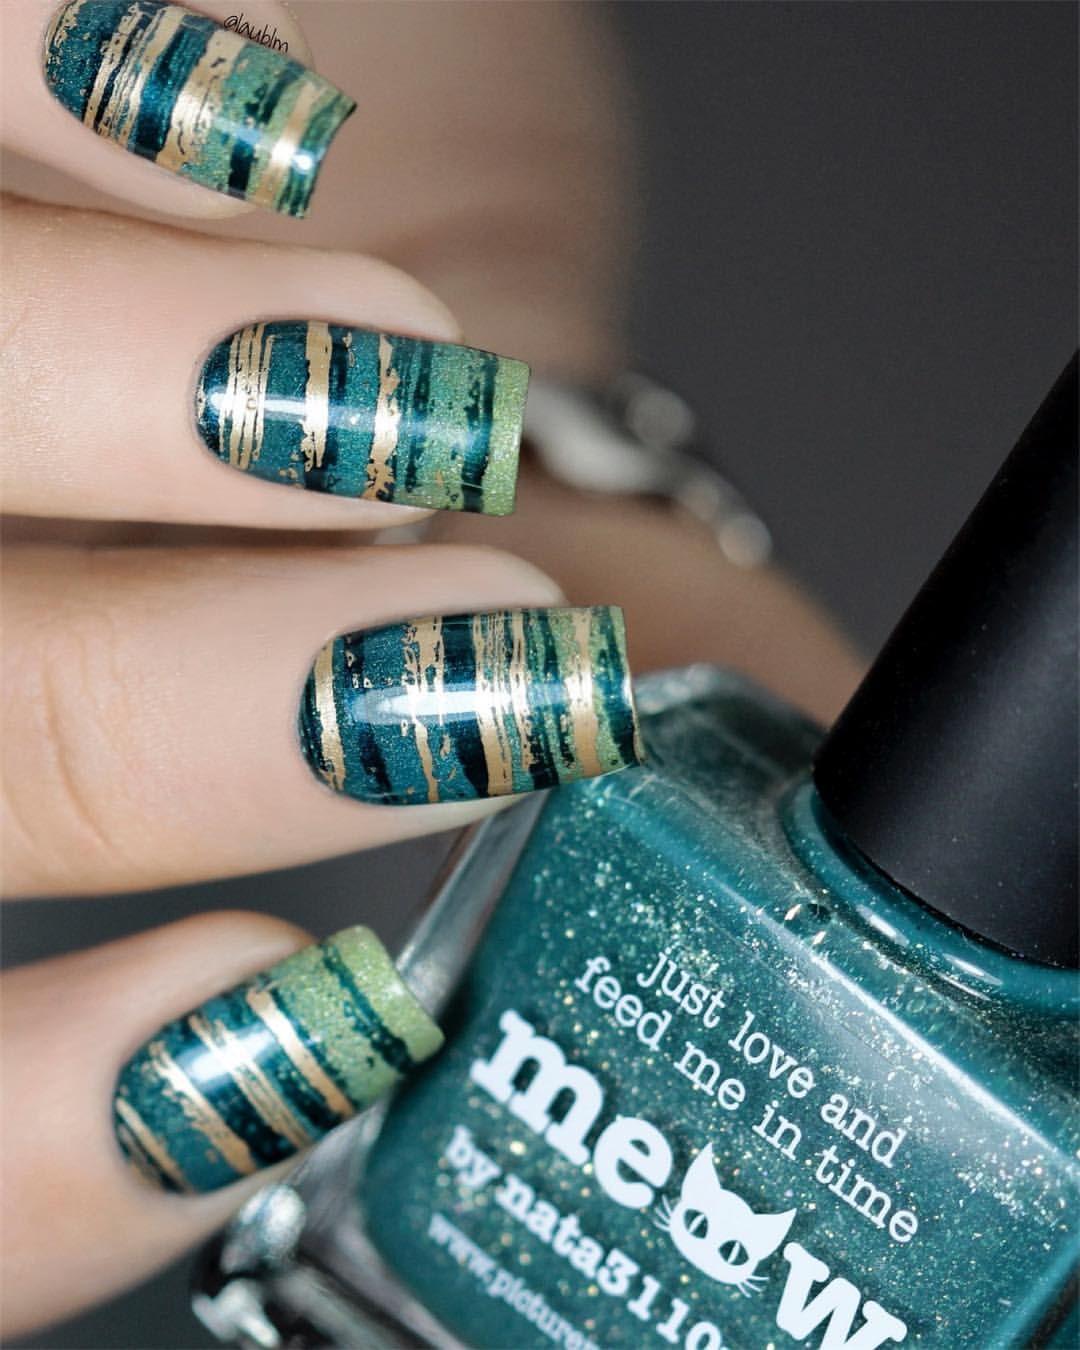 Concrete And Nail Polish Striped Nail Art: Gradient Teal To Green, Gold & Black Horizontal Stripes